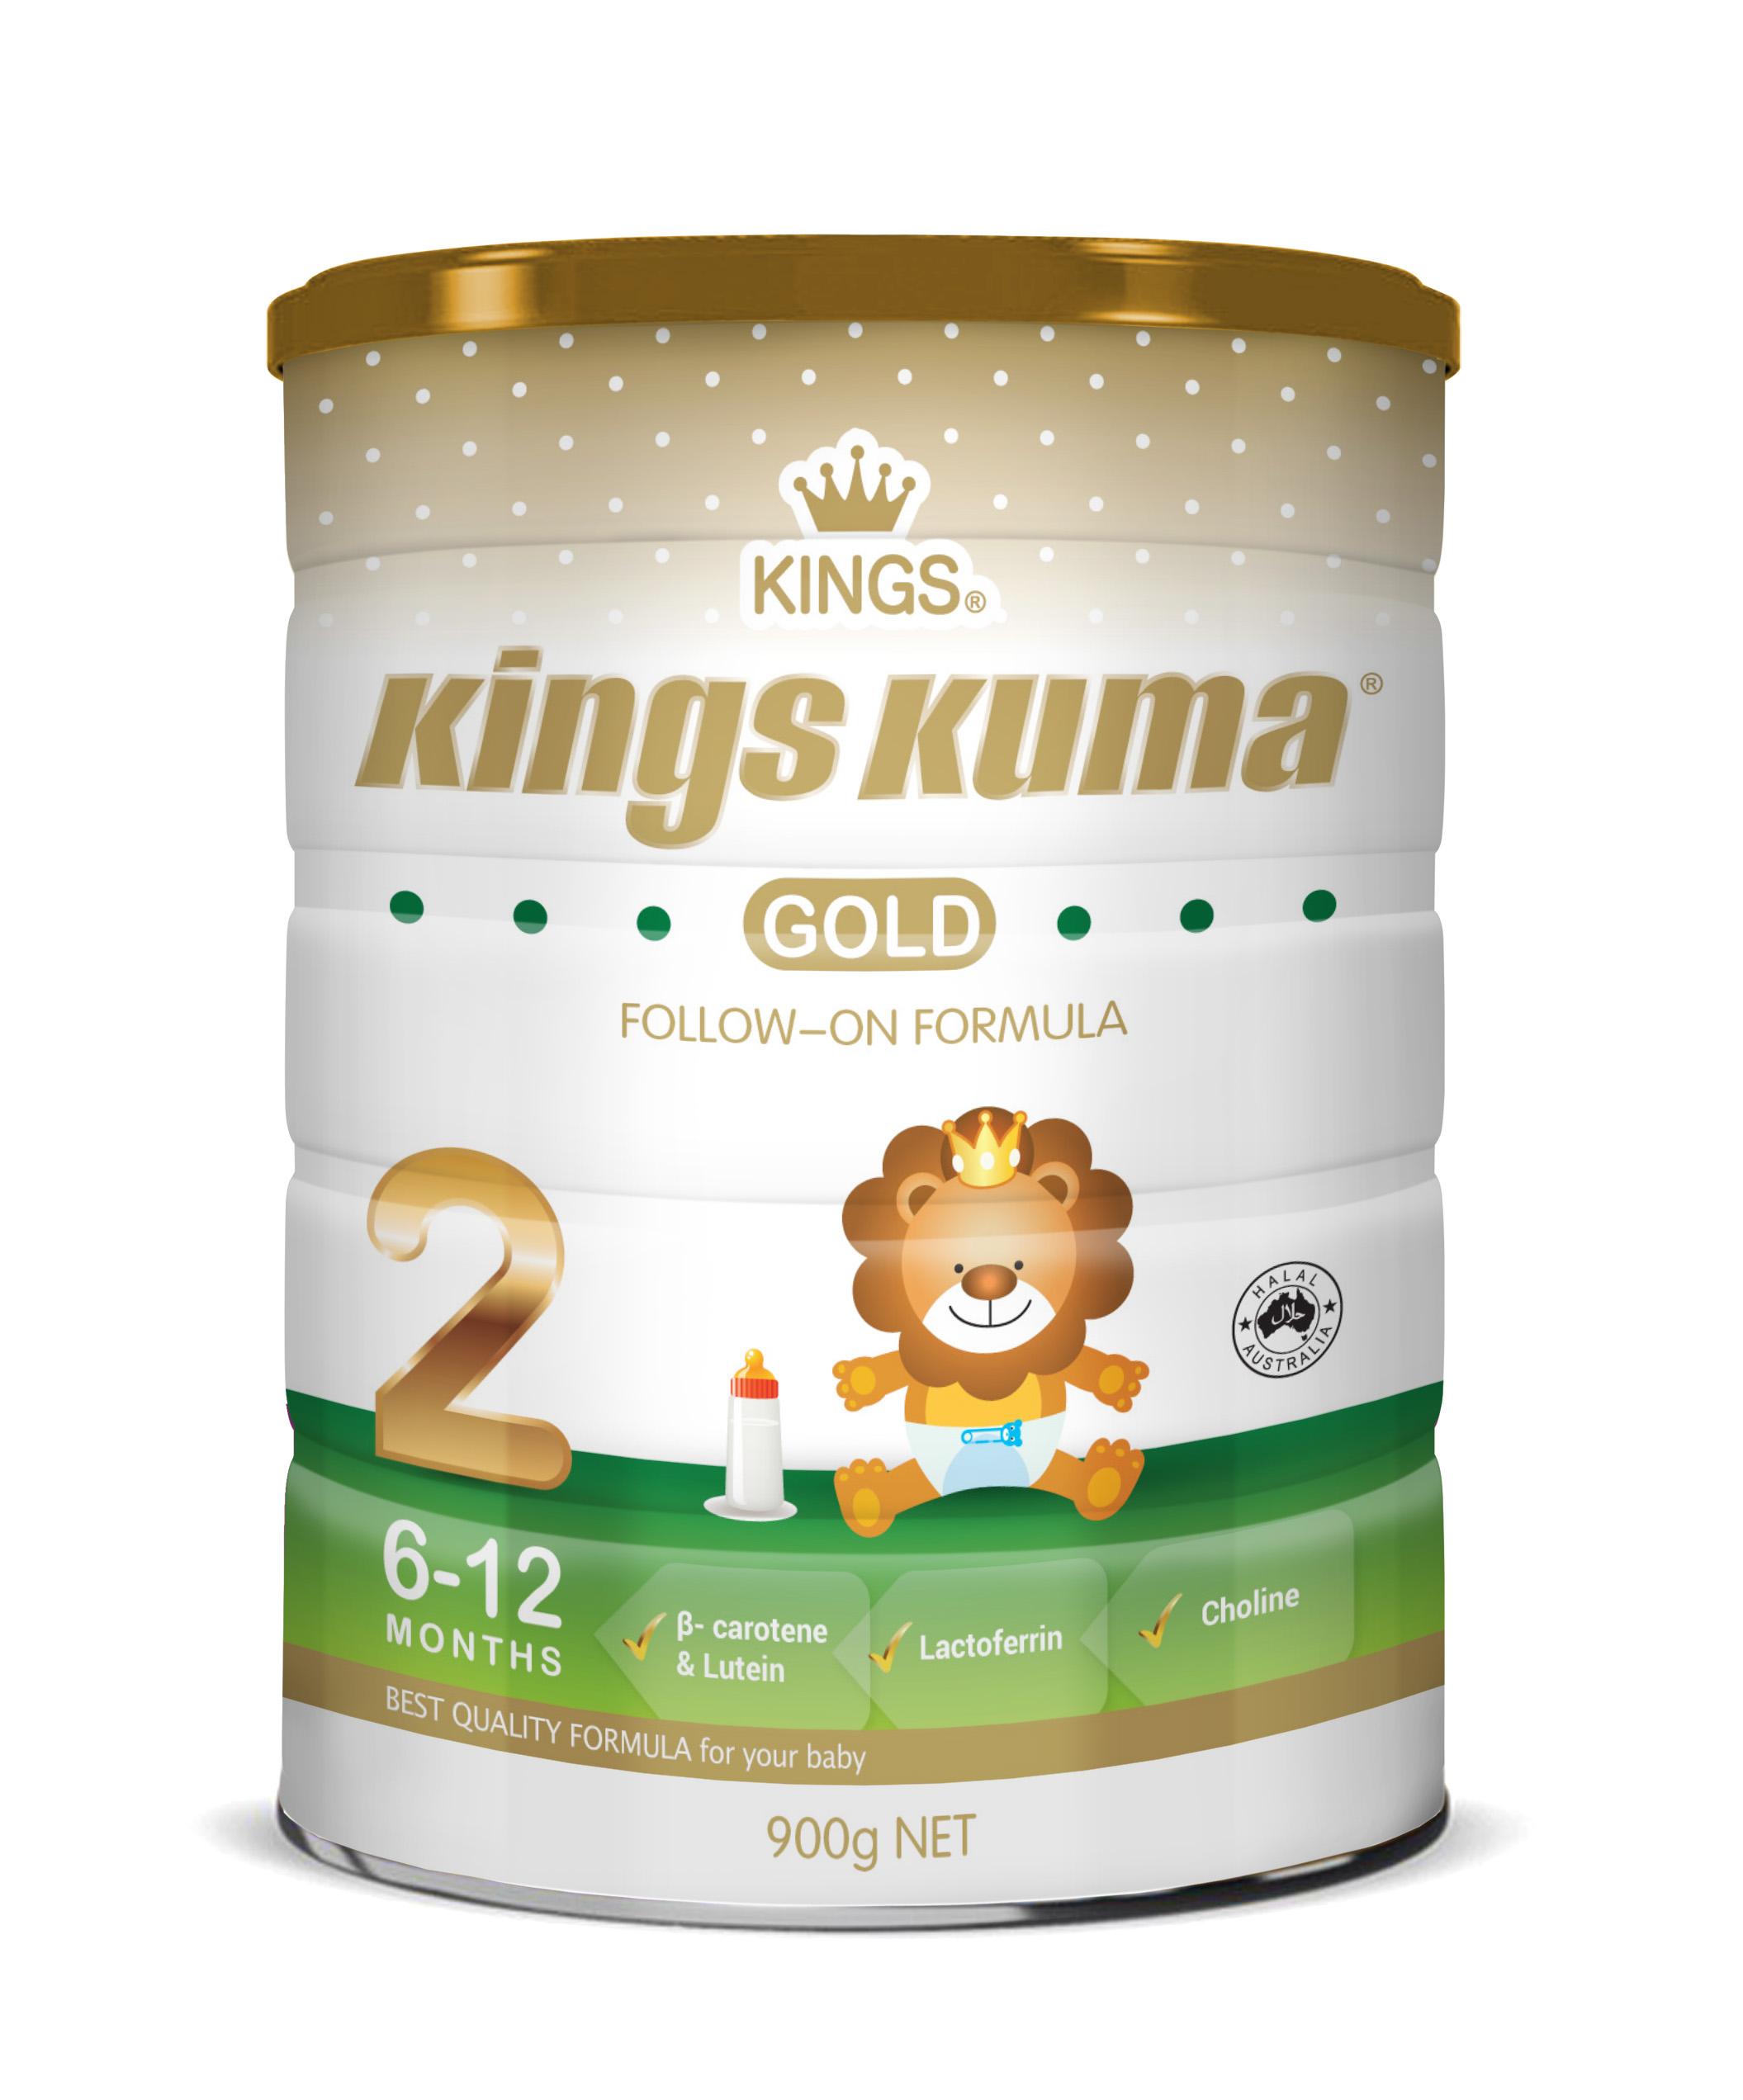 KINGS KUMA Infant Formula Step 2 (6-12 months)